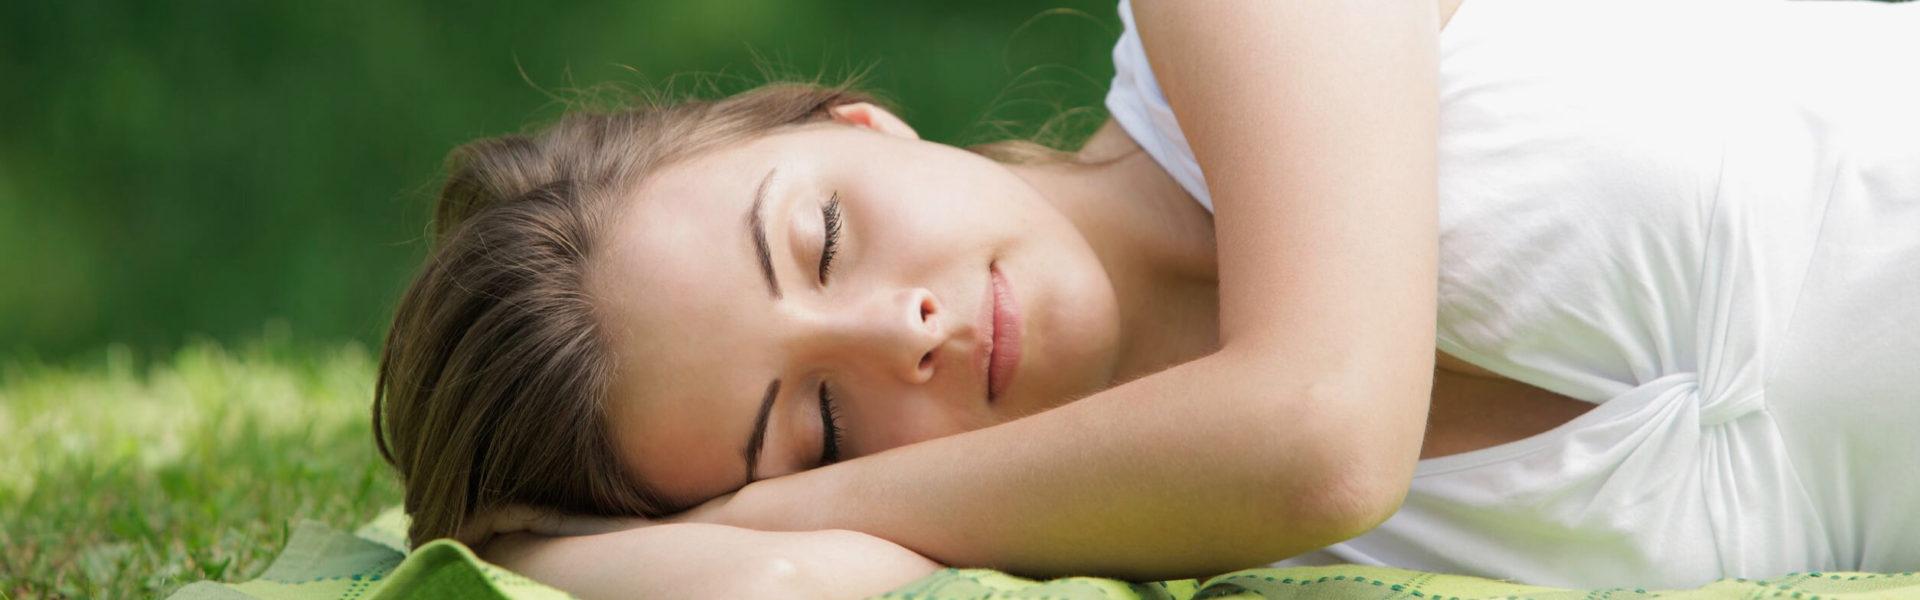 bella mujer relajada durmiendo naturaleza